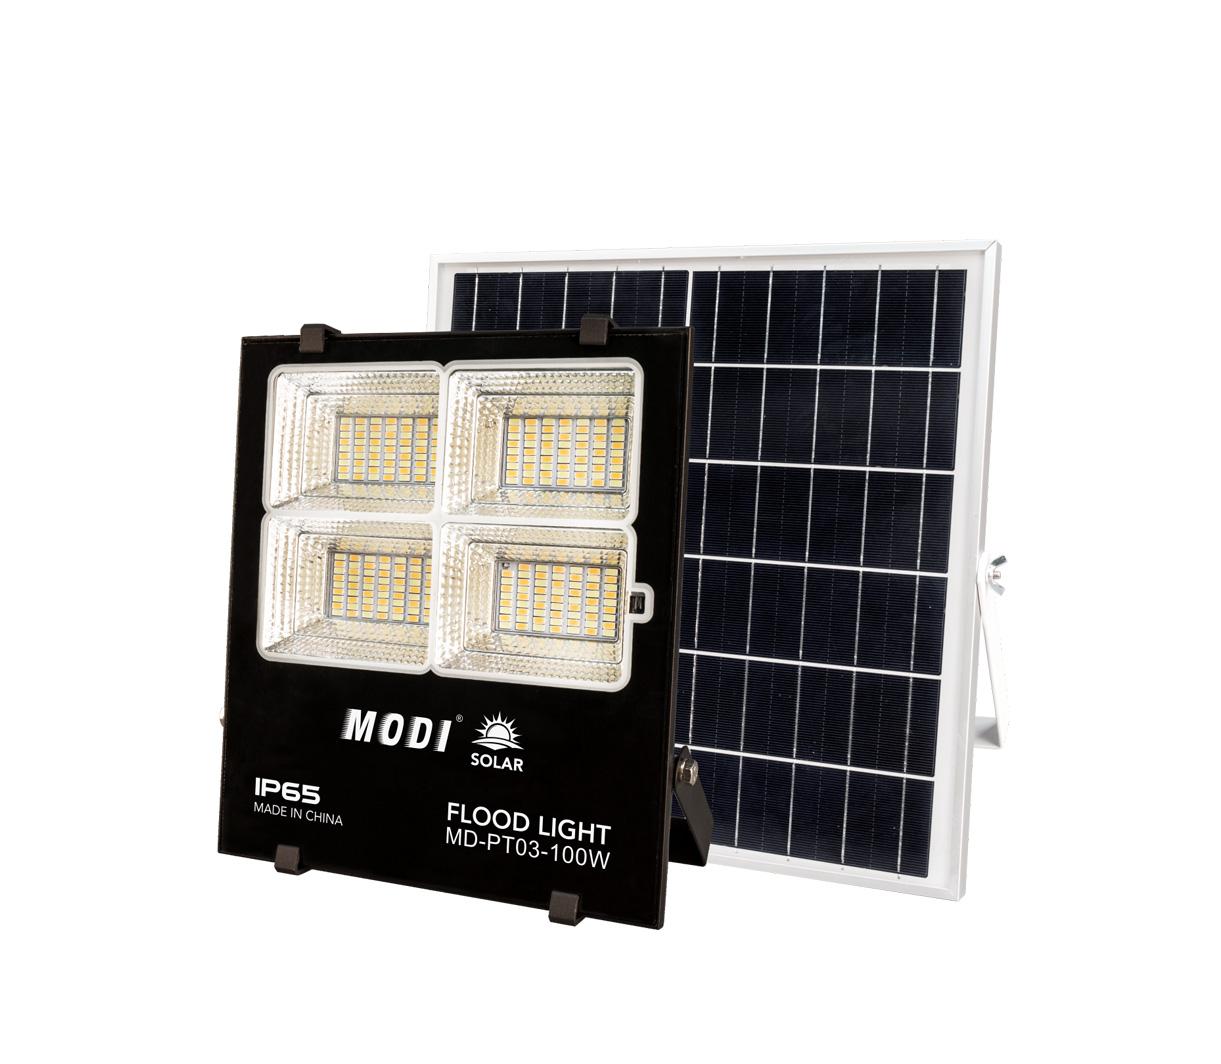 Bspro Company 100w solar led flood light outdoor solar flood light led withnew design solar and wind street lights